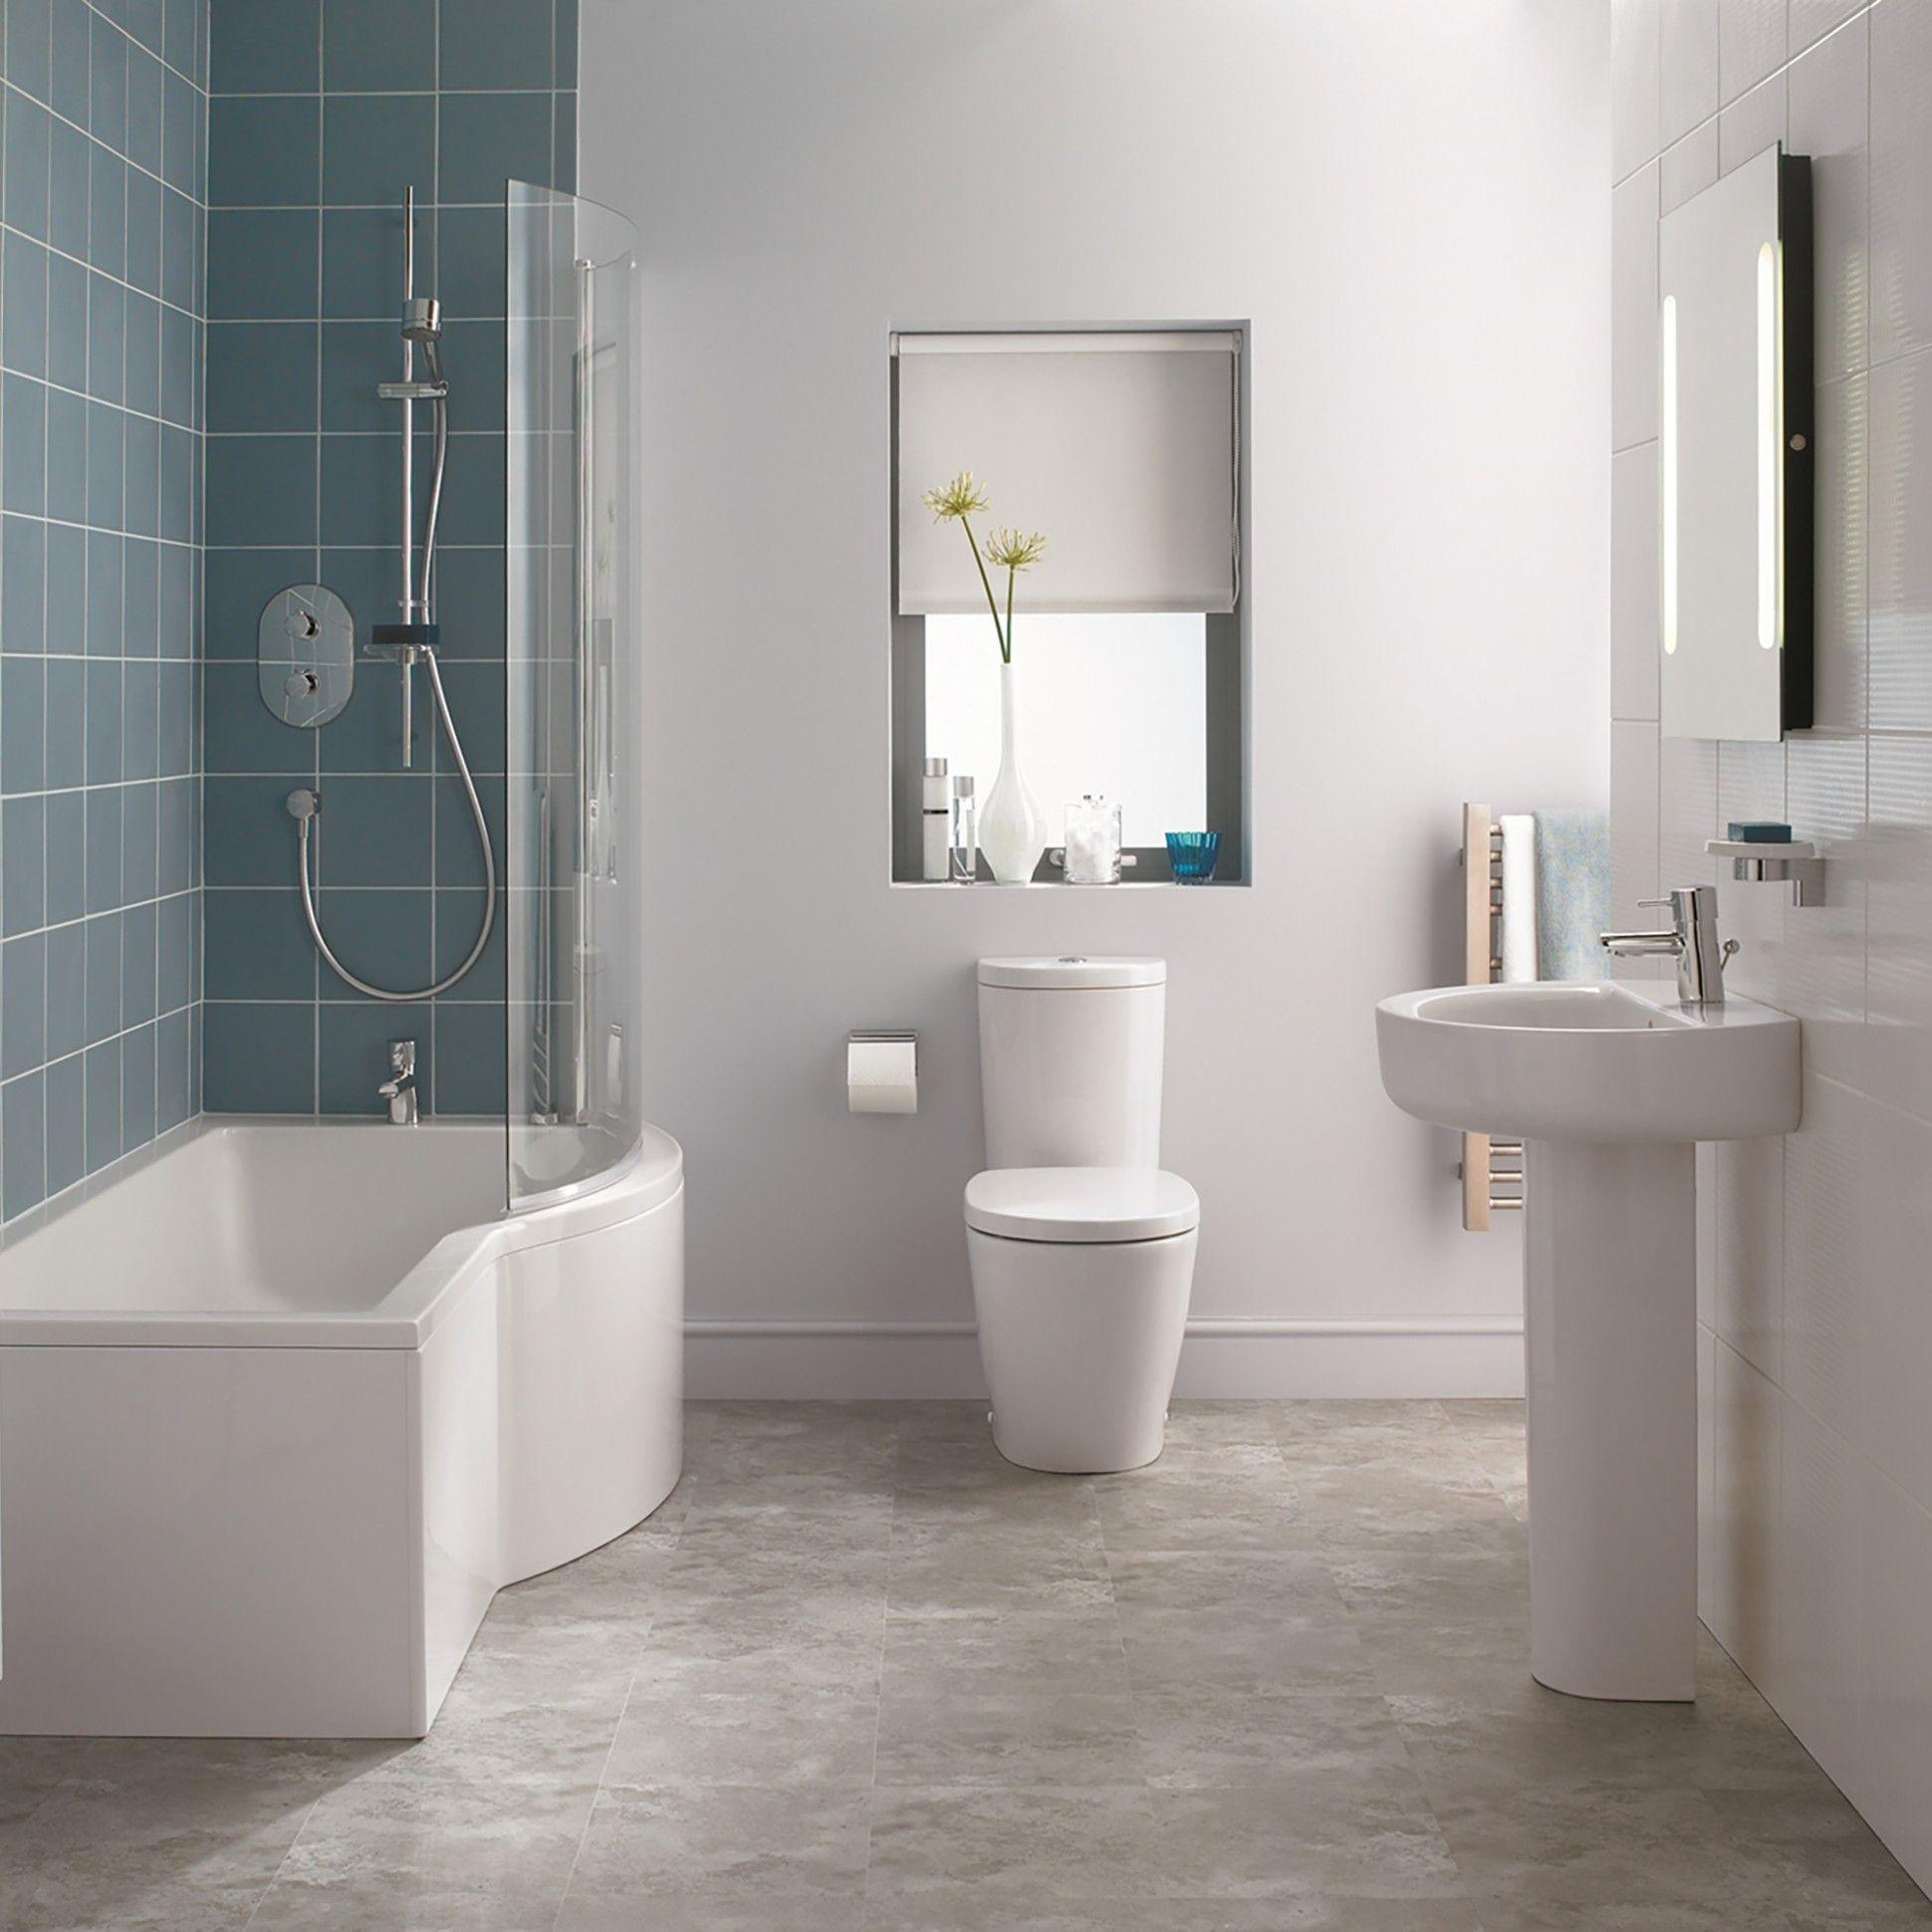 Bathroom Ideas Homebase in 9  Industrial bathroom decor